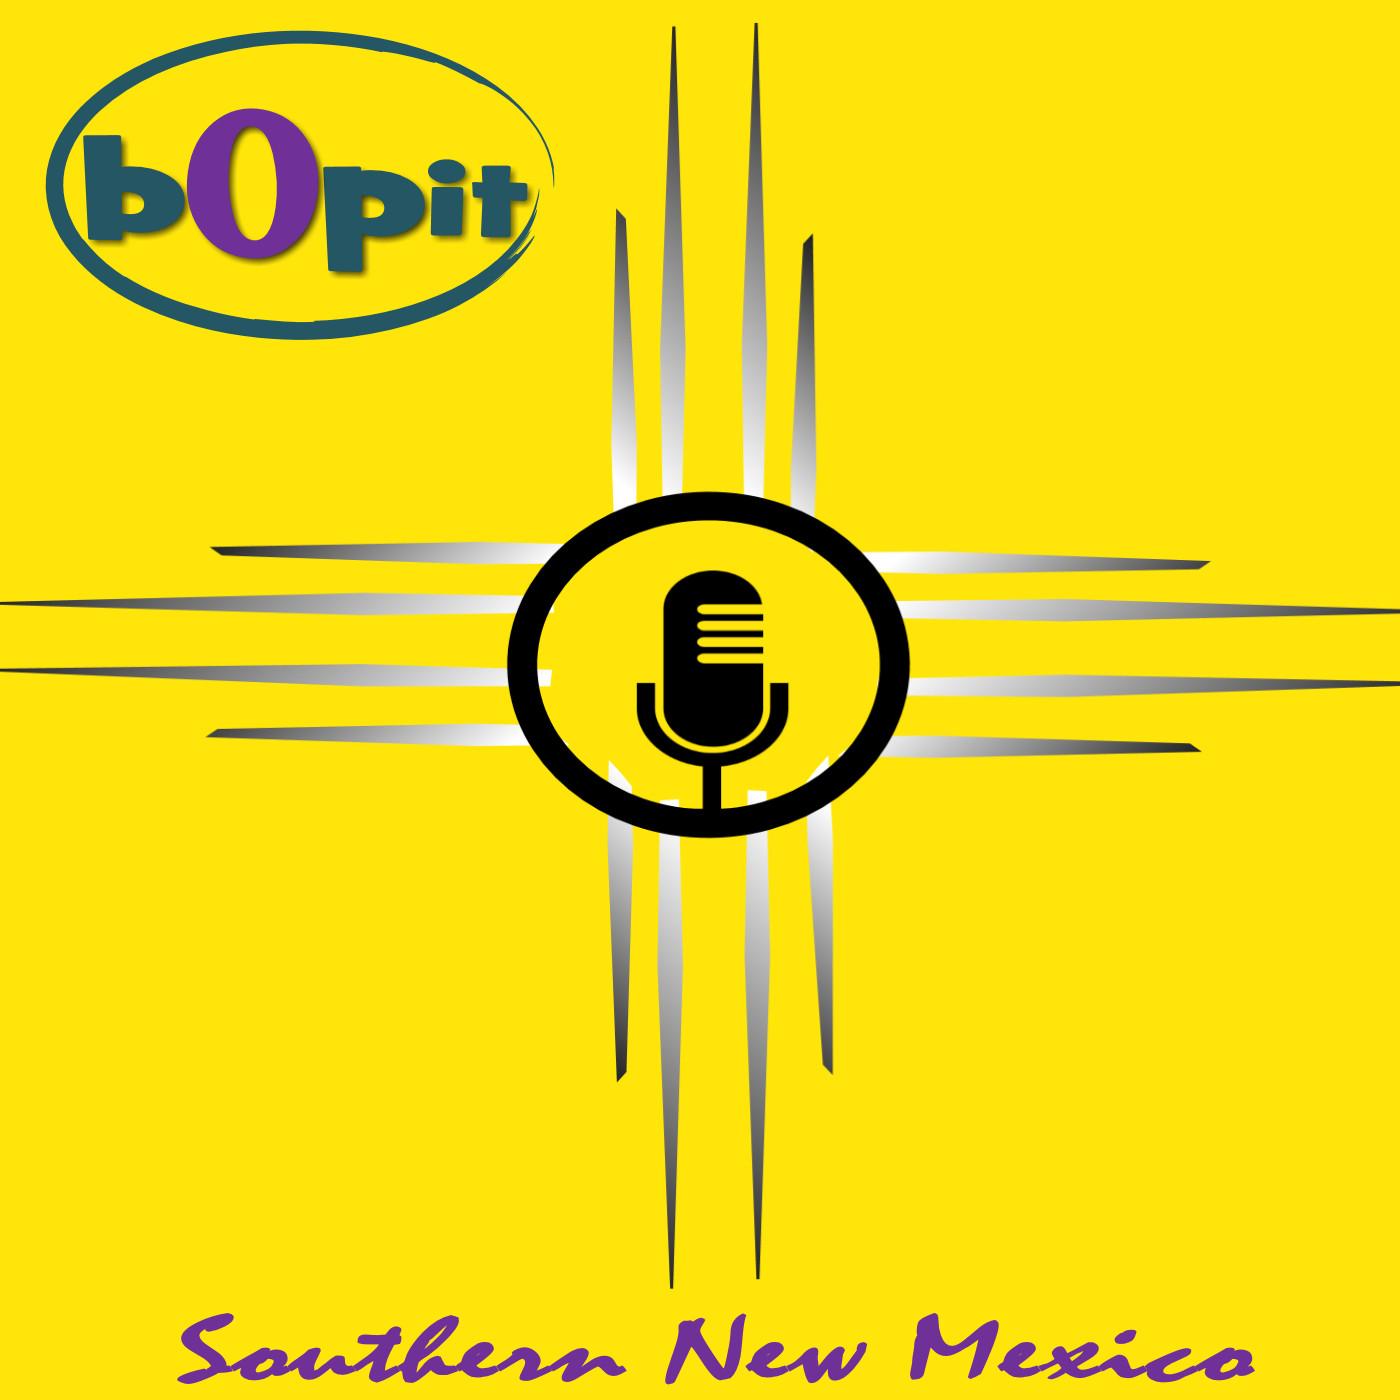 bOpitRadioSNM's podcast